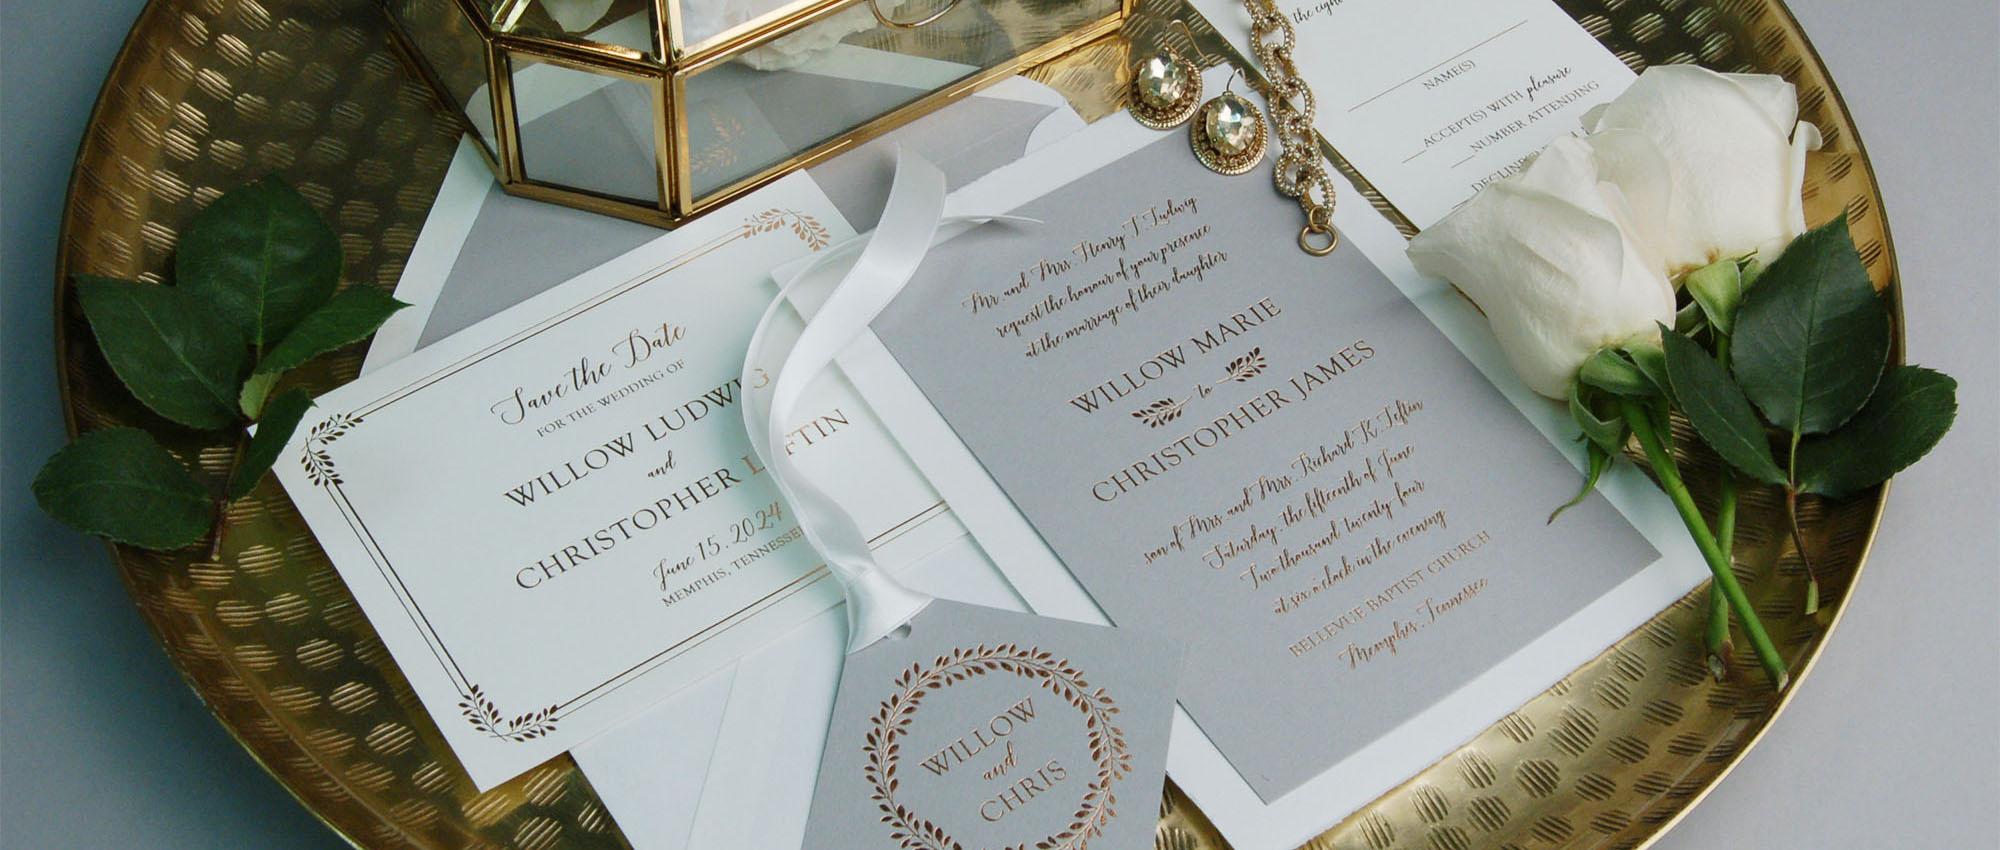 Wedding Invitations Houston Houston Tx Dgz Invitations And More